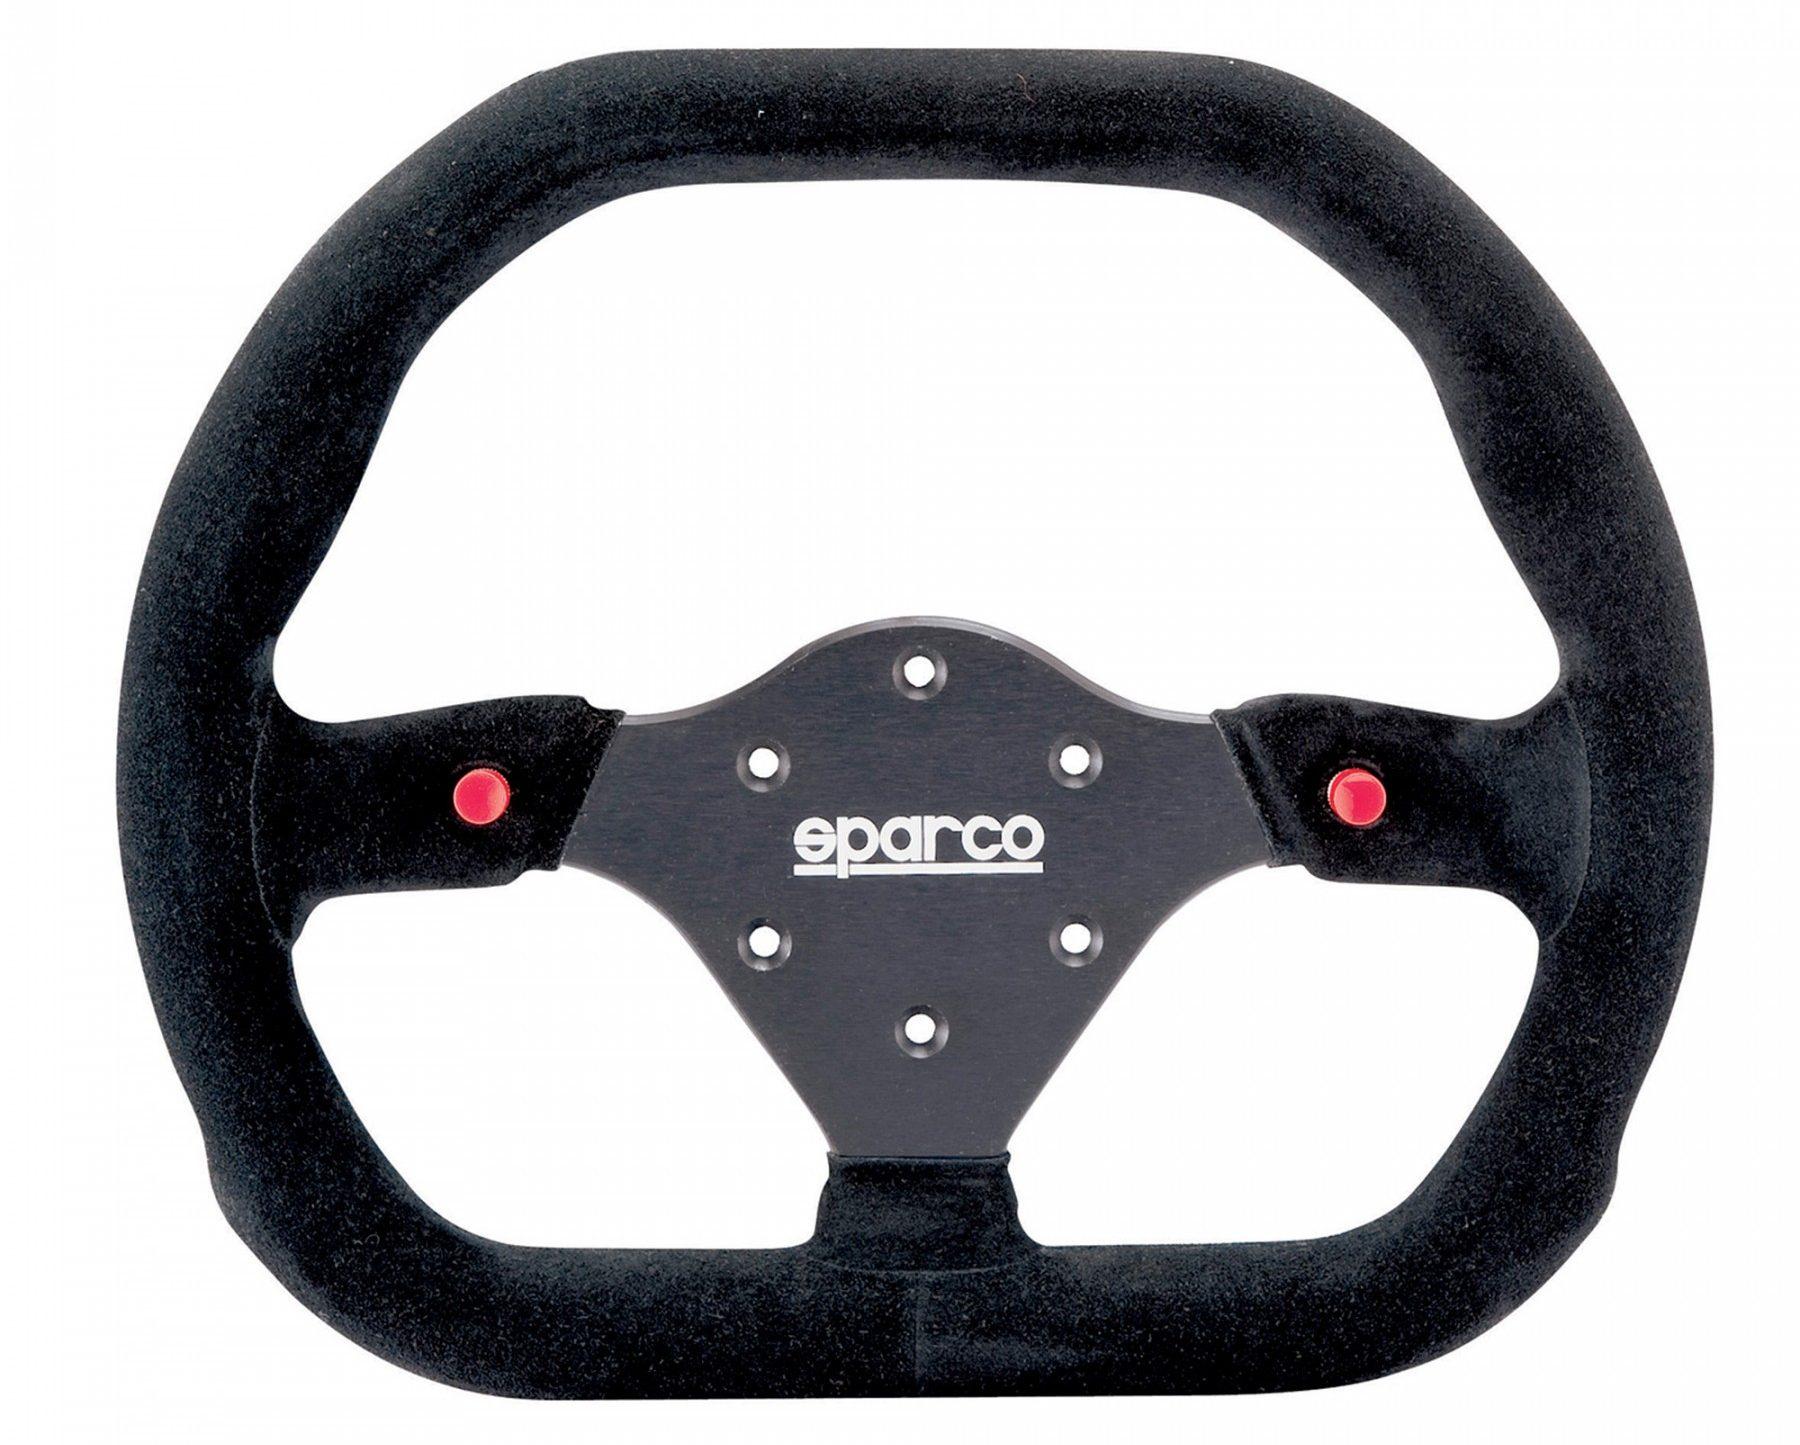 Нов продукт: Sparco R310, FIA Racing Steering Wheel